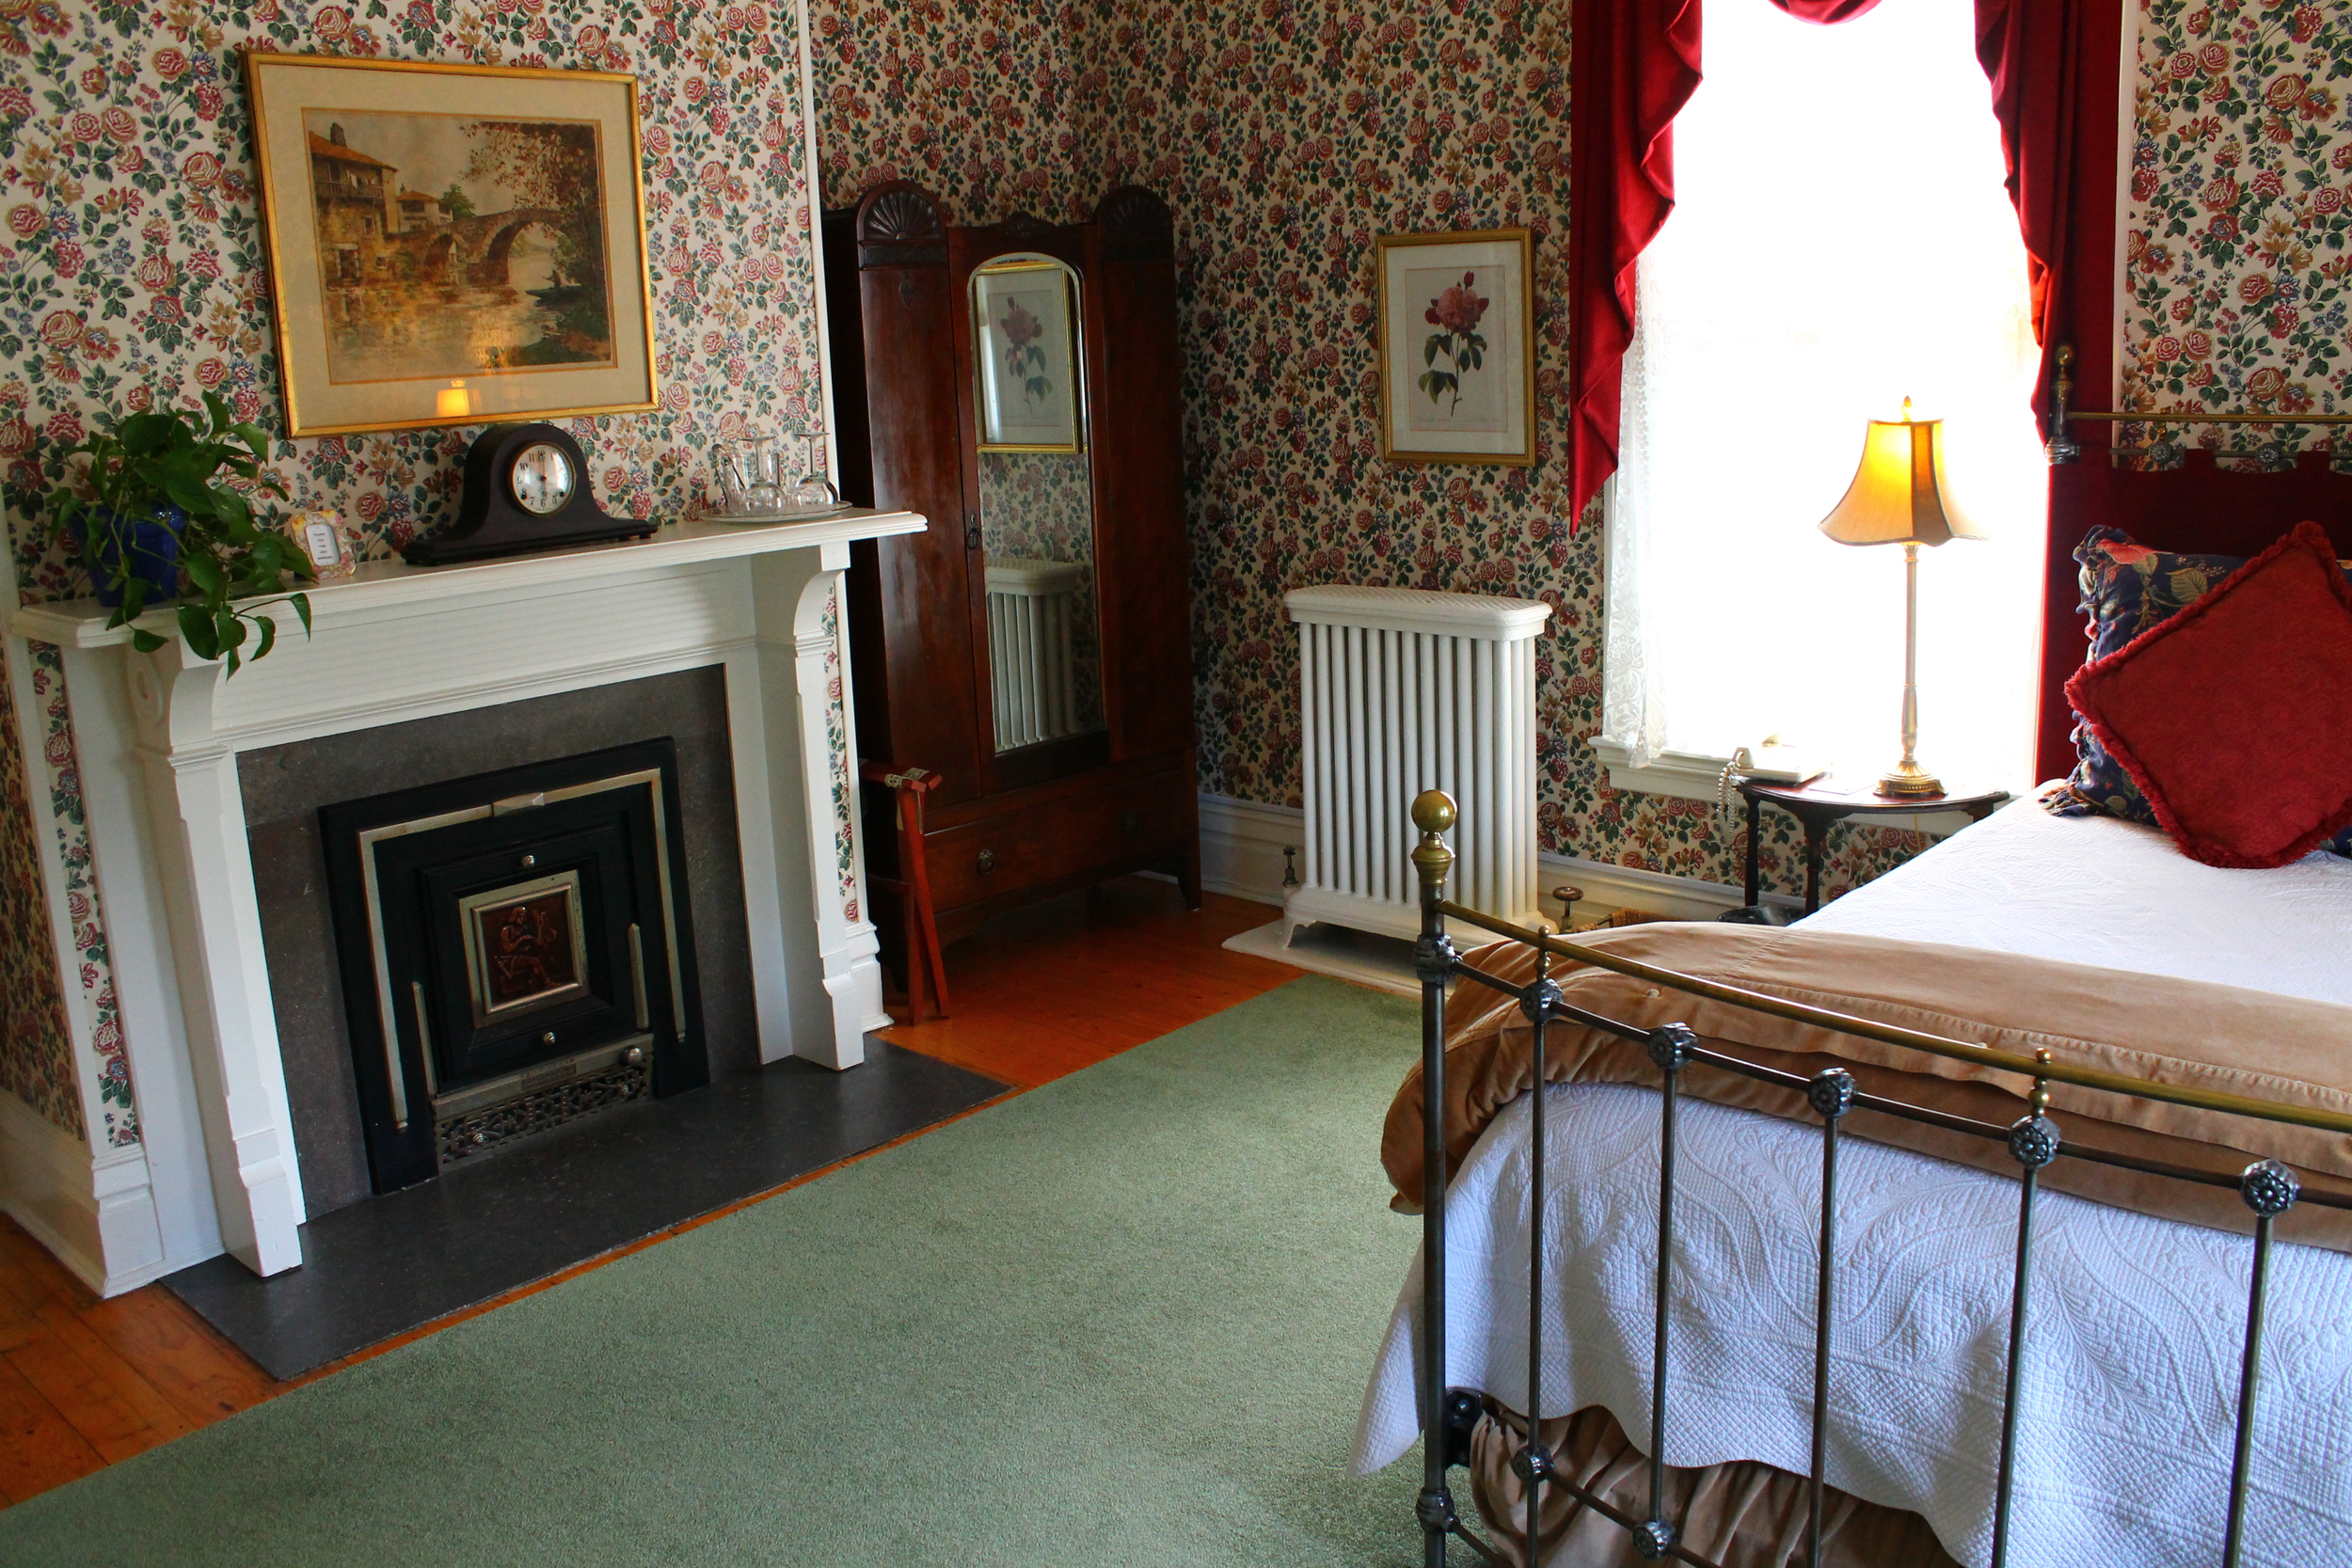 Victorian Cabernet, Rm 2 of the Willard Street Inn